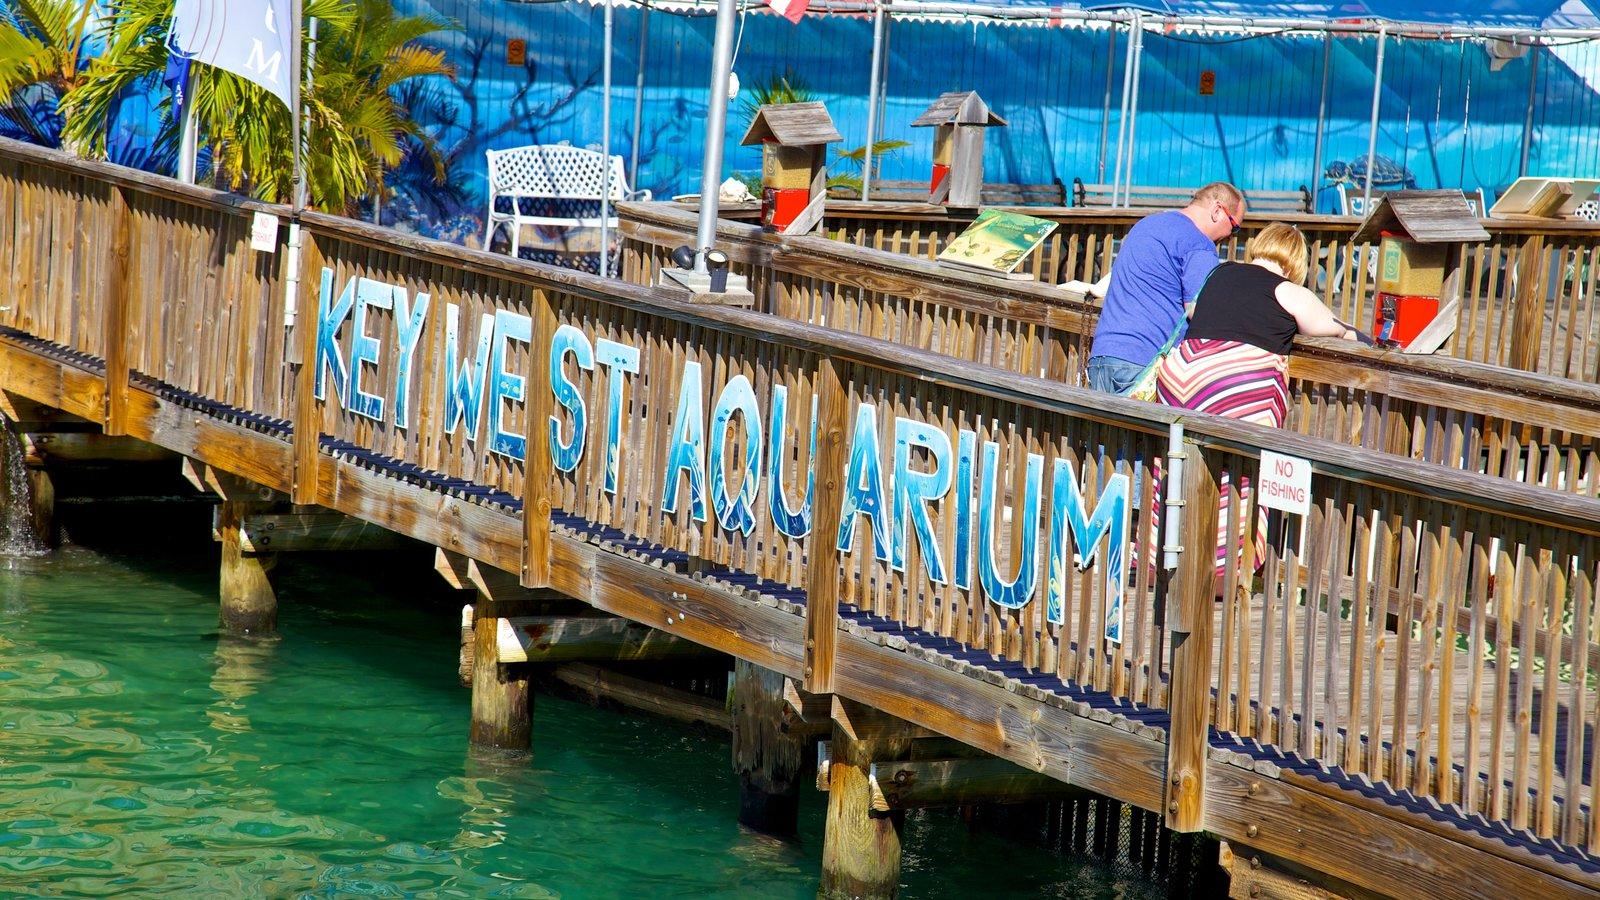 Key West Aquarium Pictures View Photos Images Of Key West Aquarium